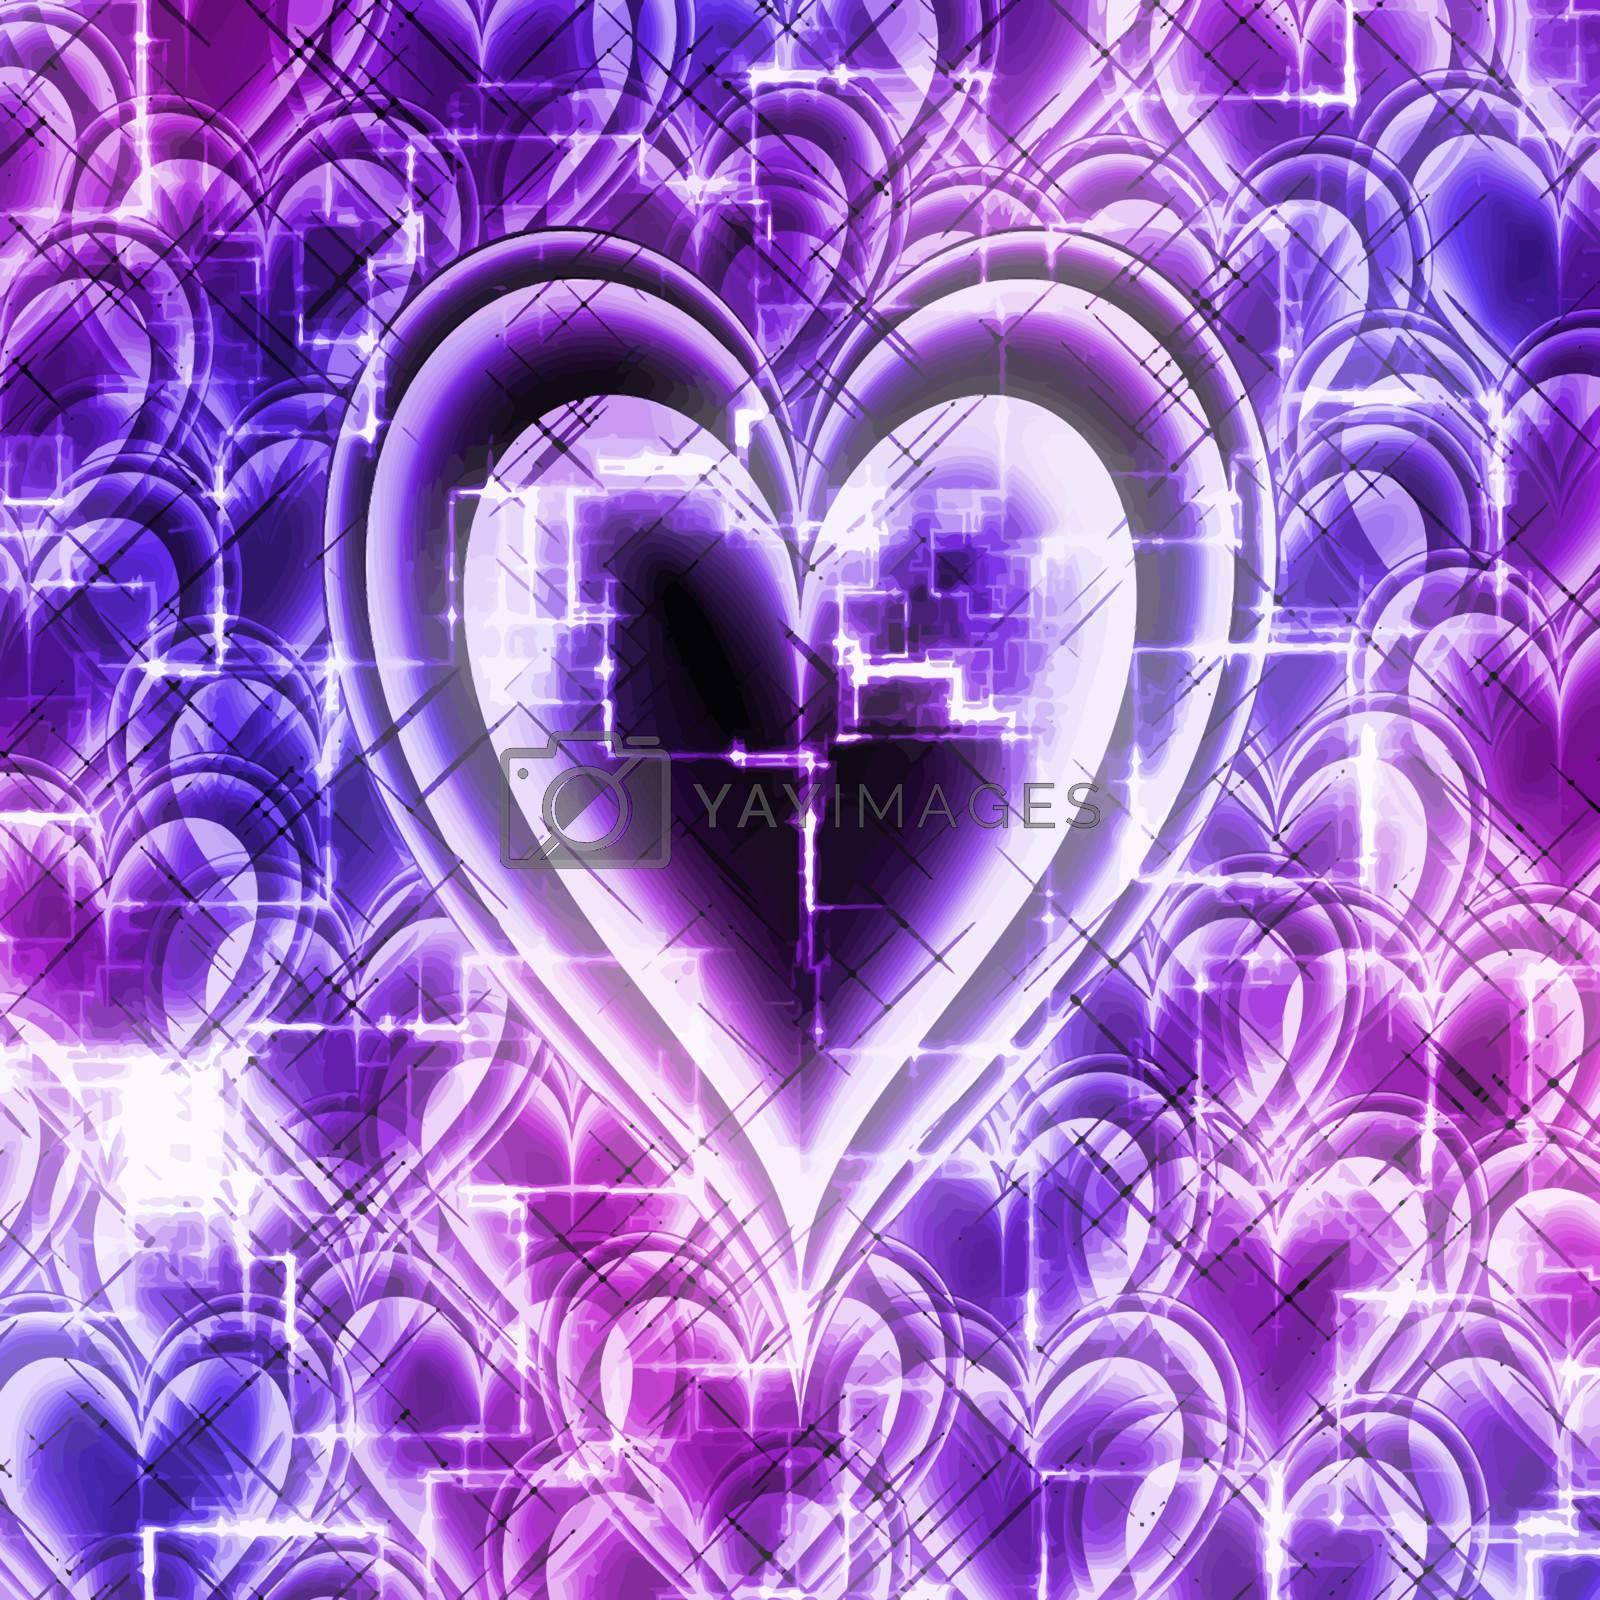 heart shape symbol in a high tech design